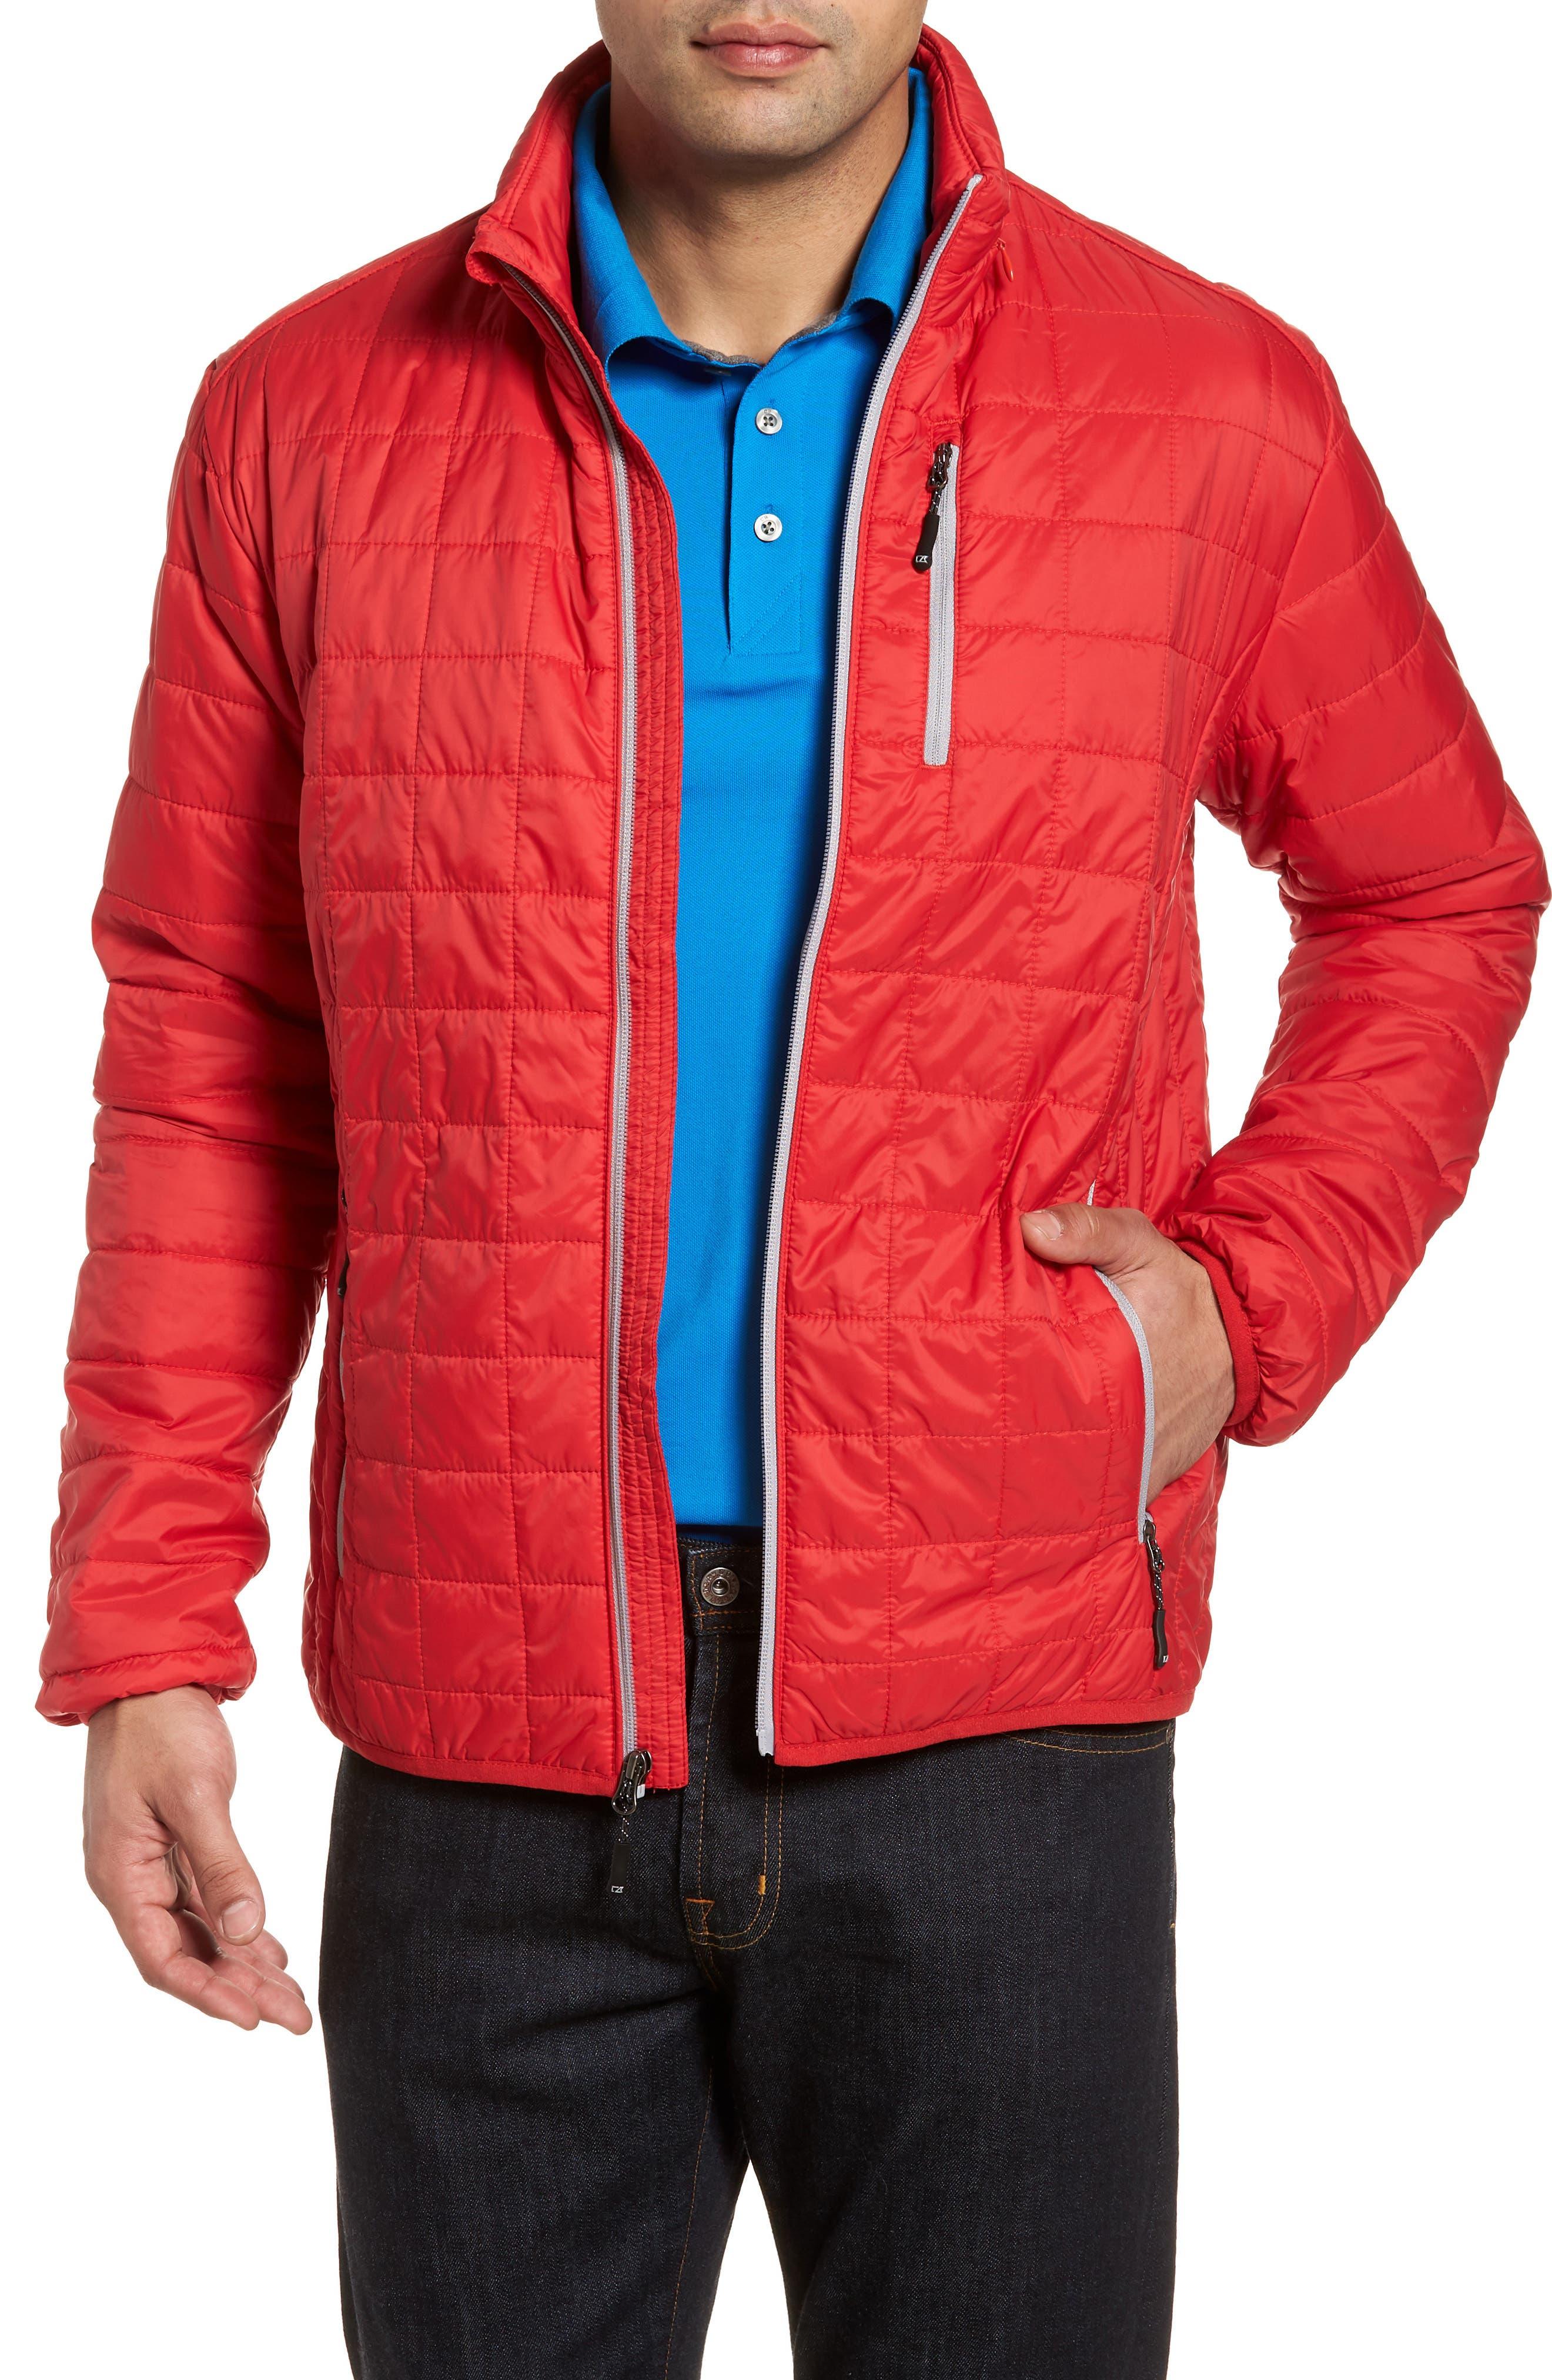 Cutter & Buck Rainier Classic Fit Jacket, Red